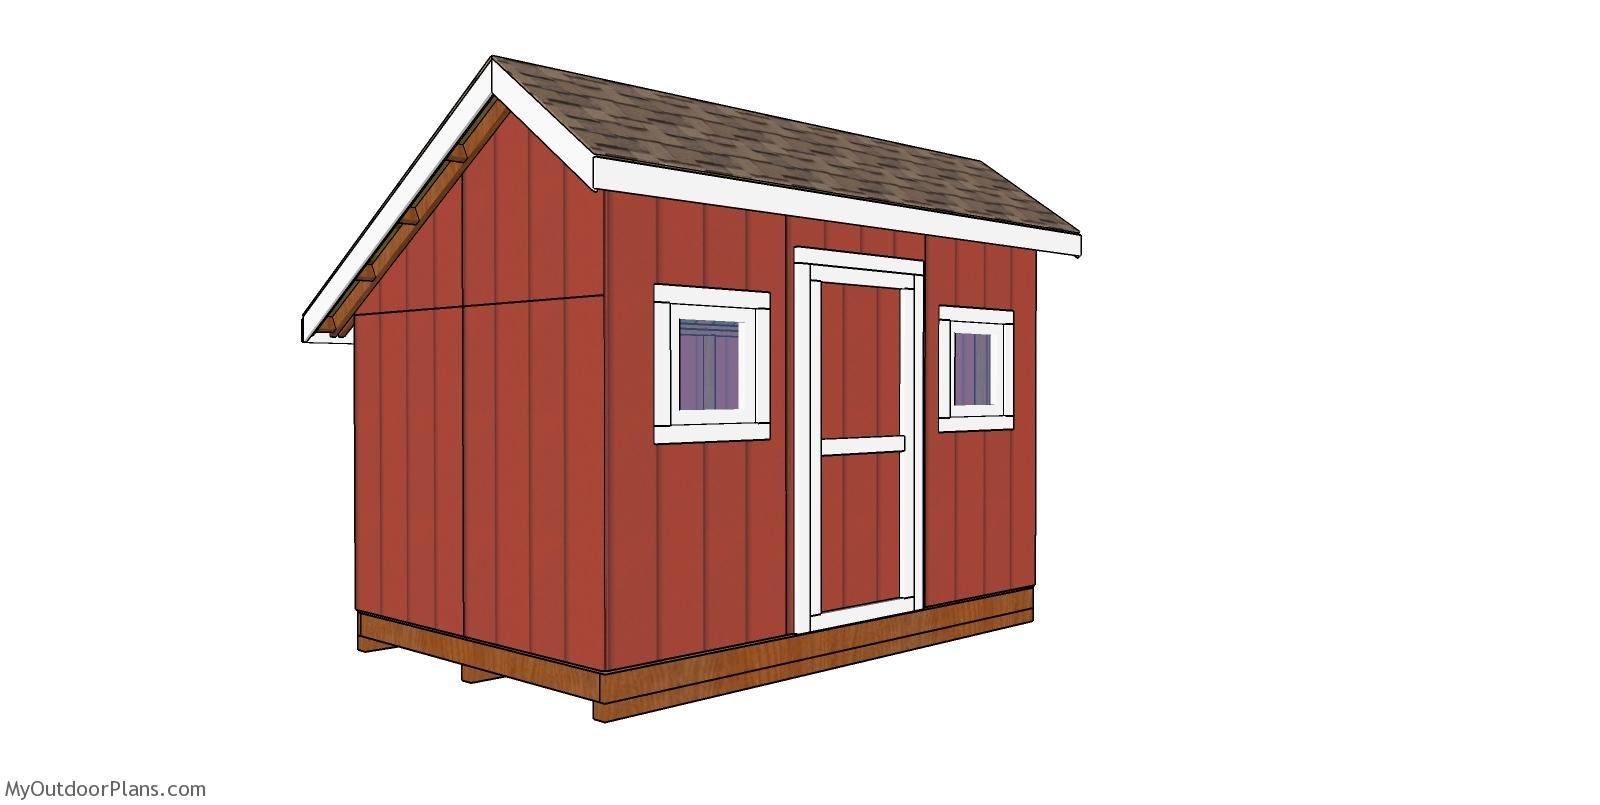 8x12 Saltbox Shed - Free DIY Plans